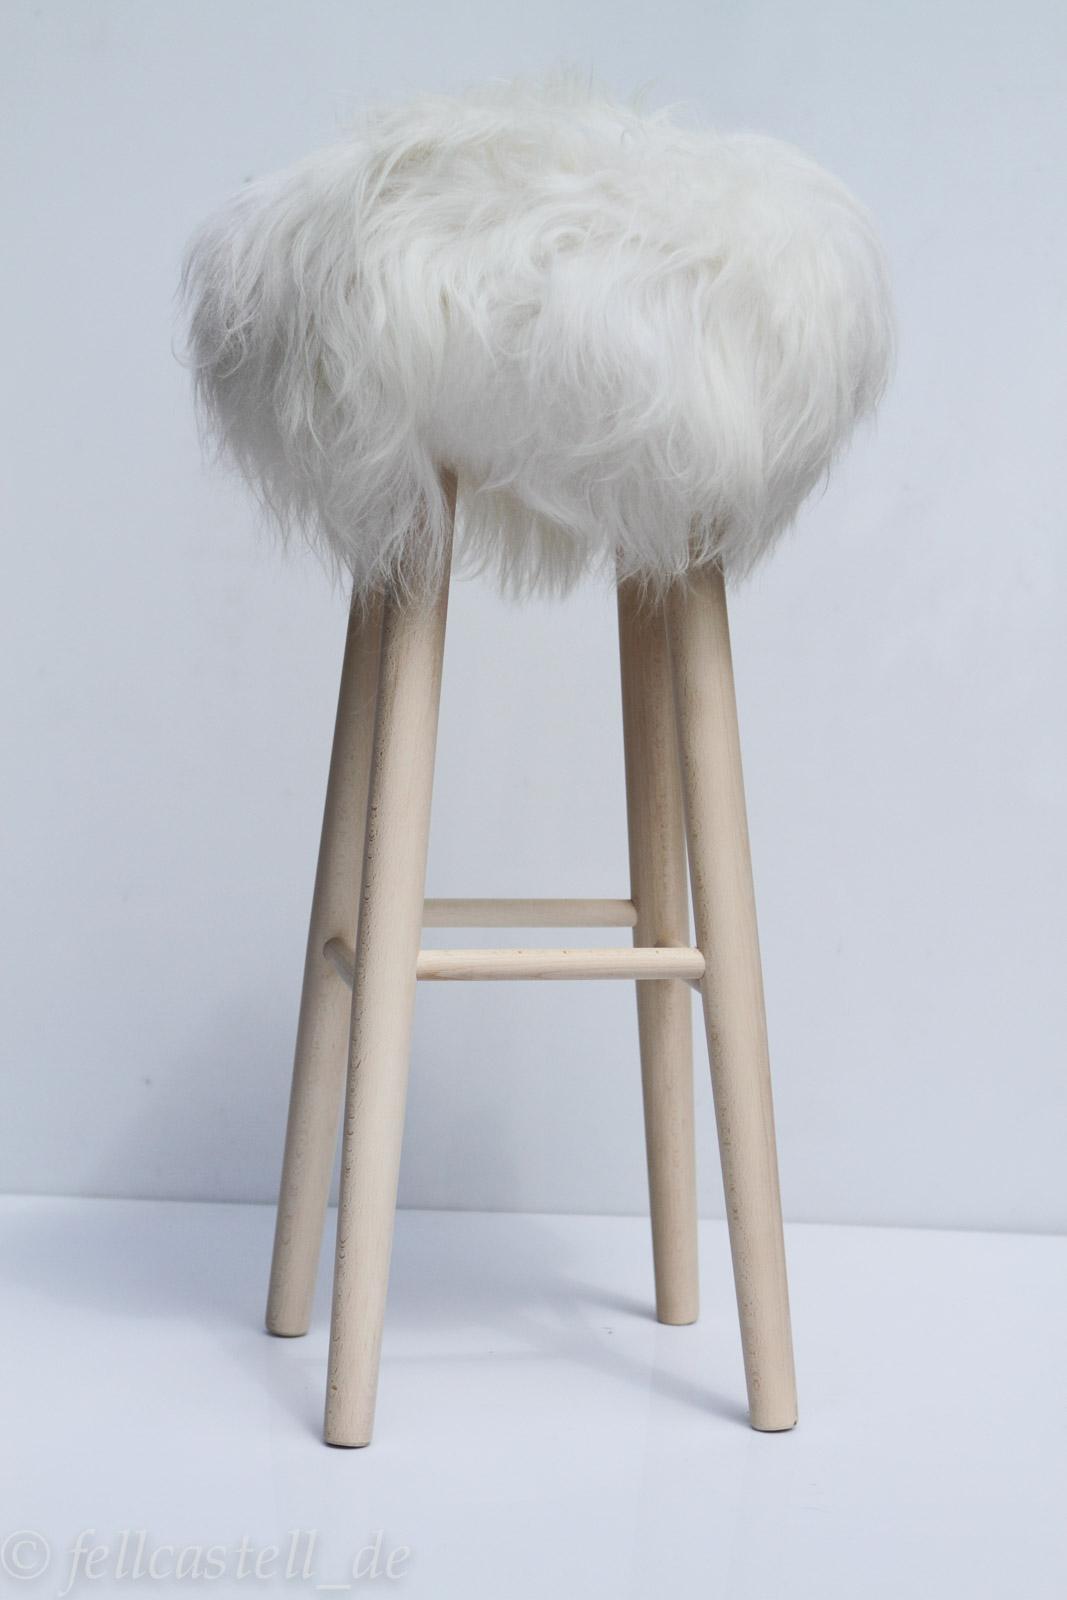 Fellhocker Barhocker mit Bezug aus Island Schaffell ca. 80 cm hoch